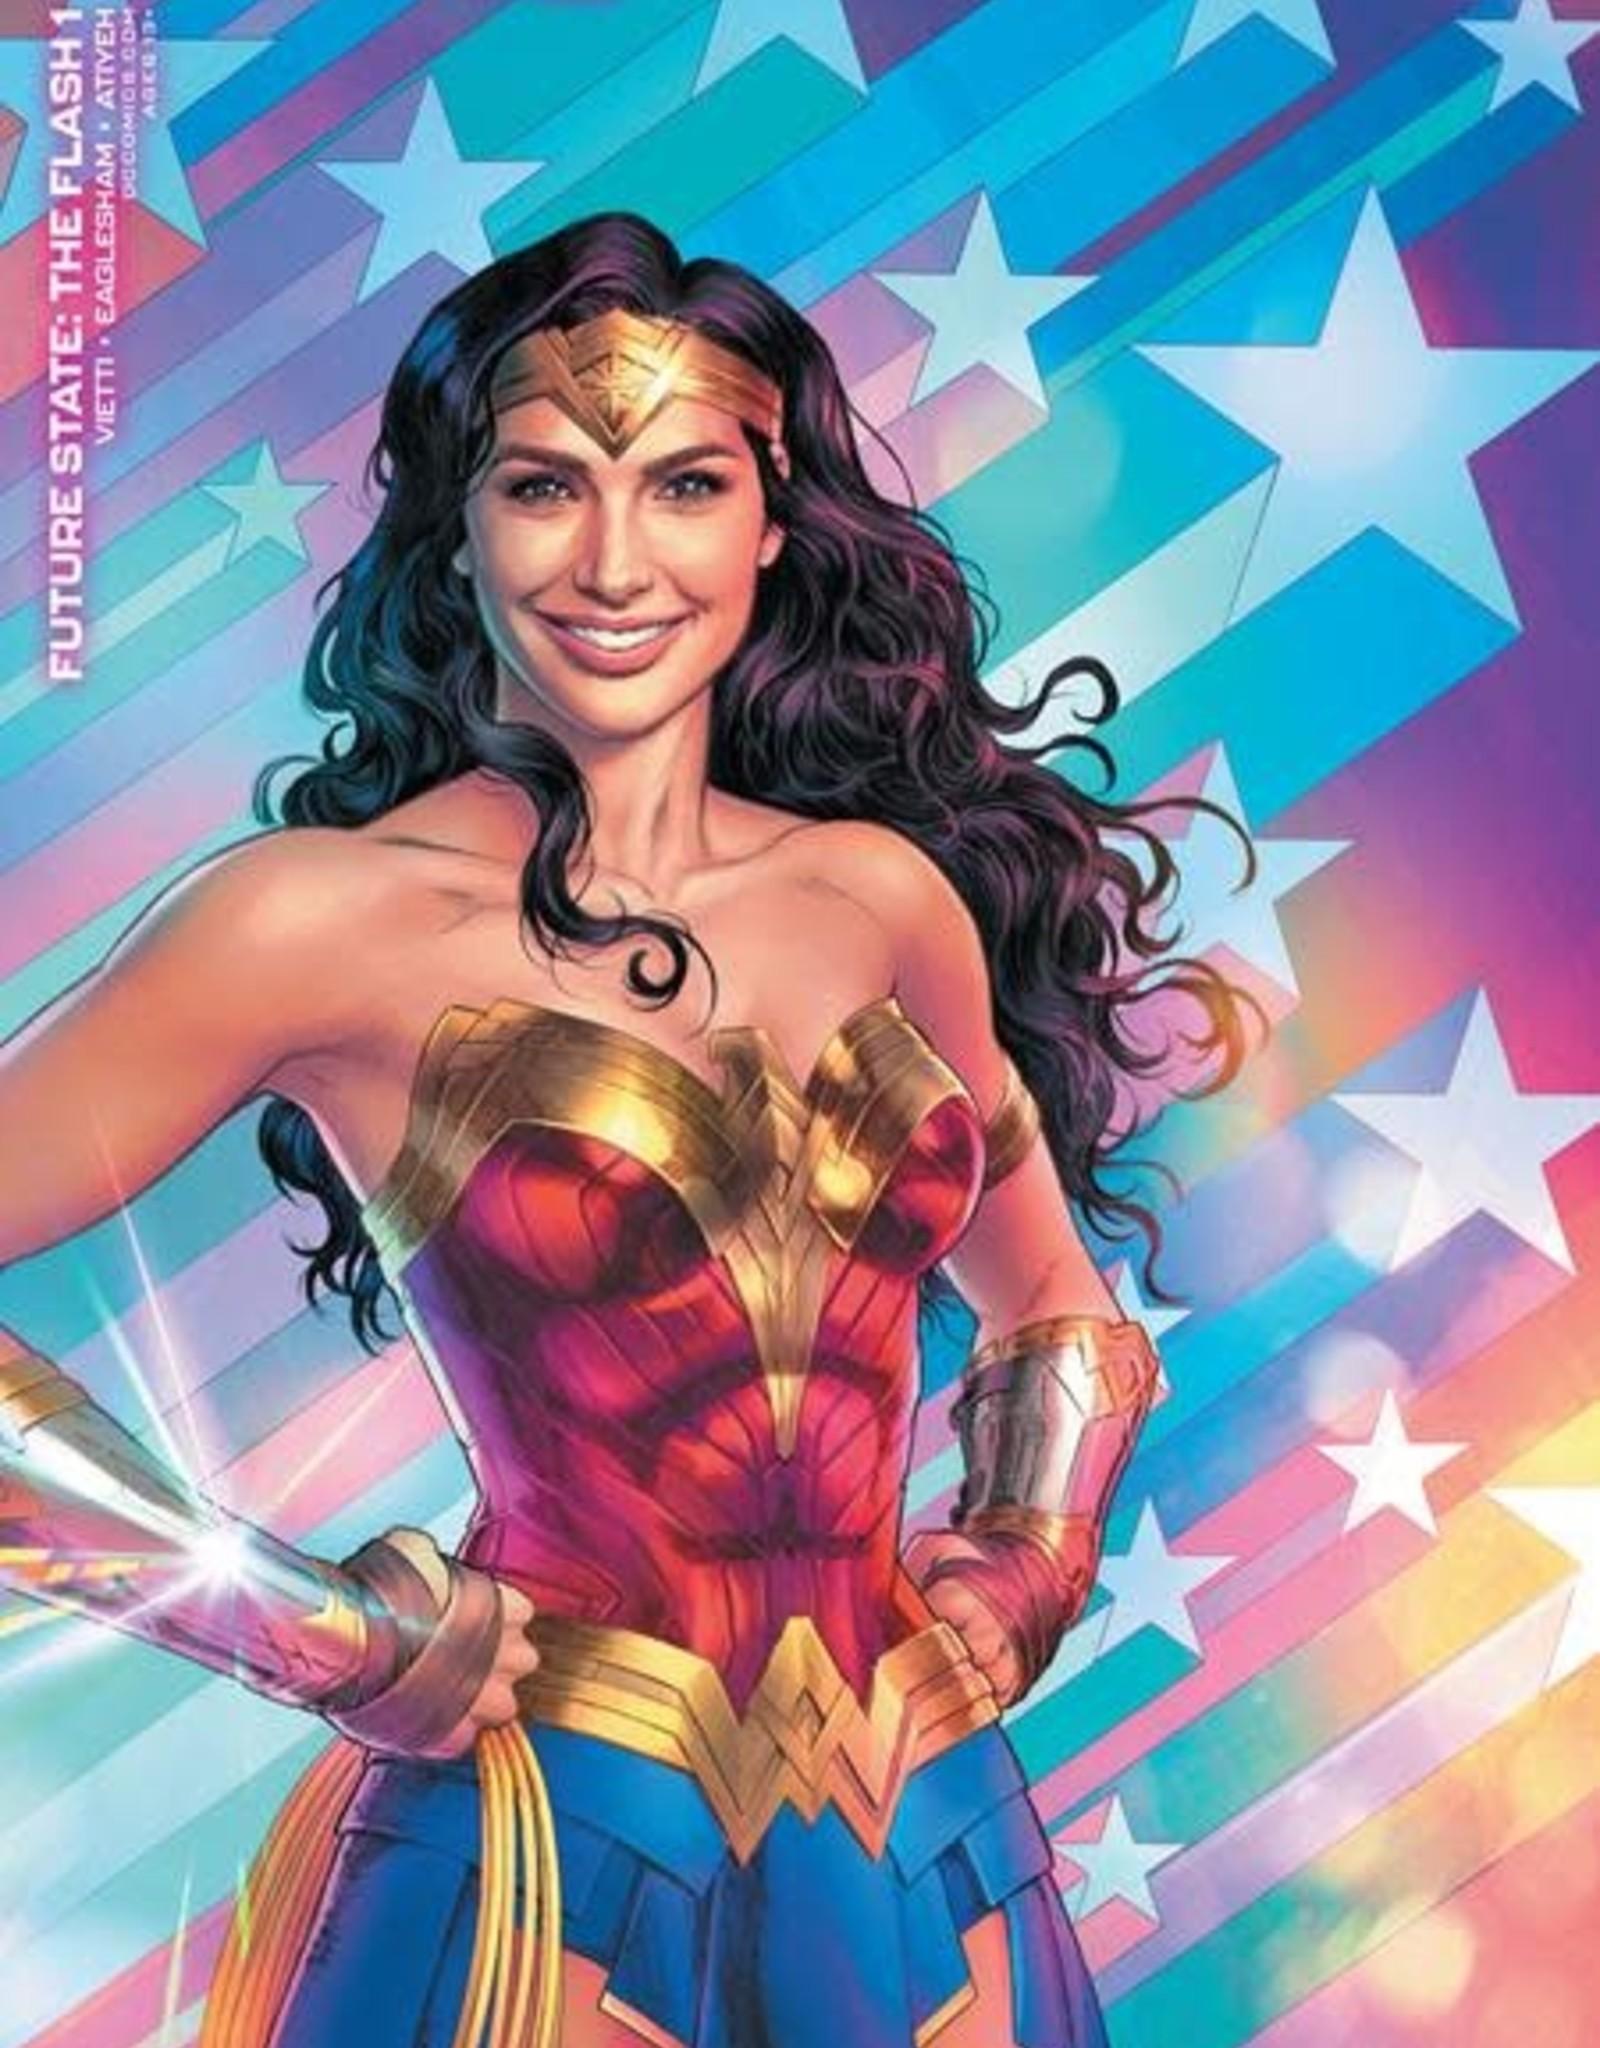 DC Comics Future State The Flash #1 Cvr C Wonder Woman 1984 Nicola Scott Card Stock Var